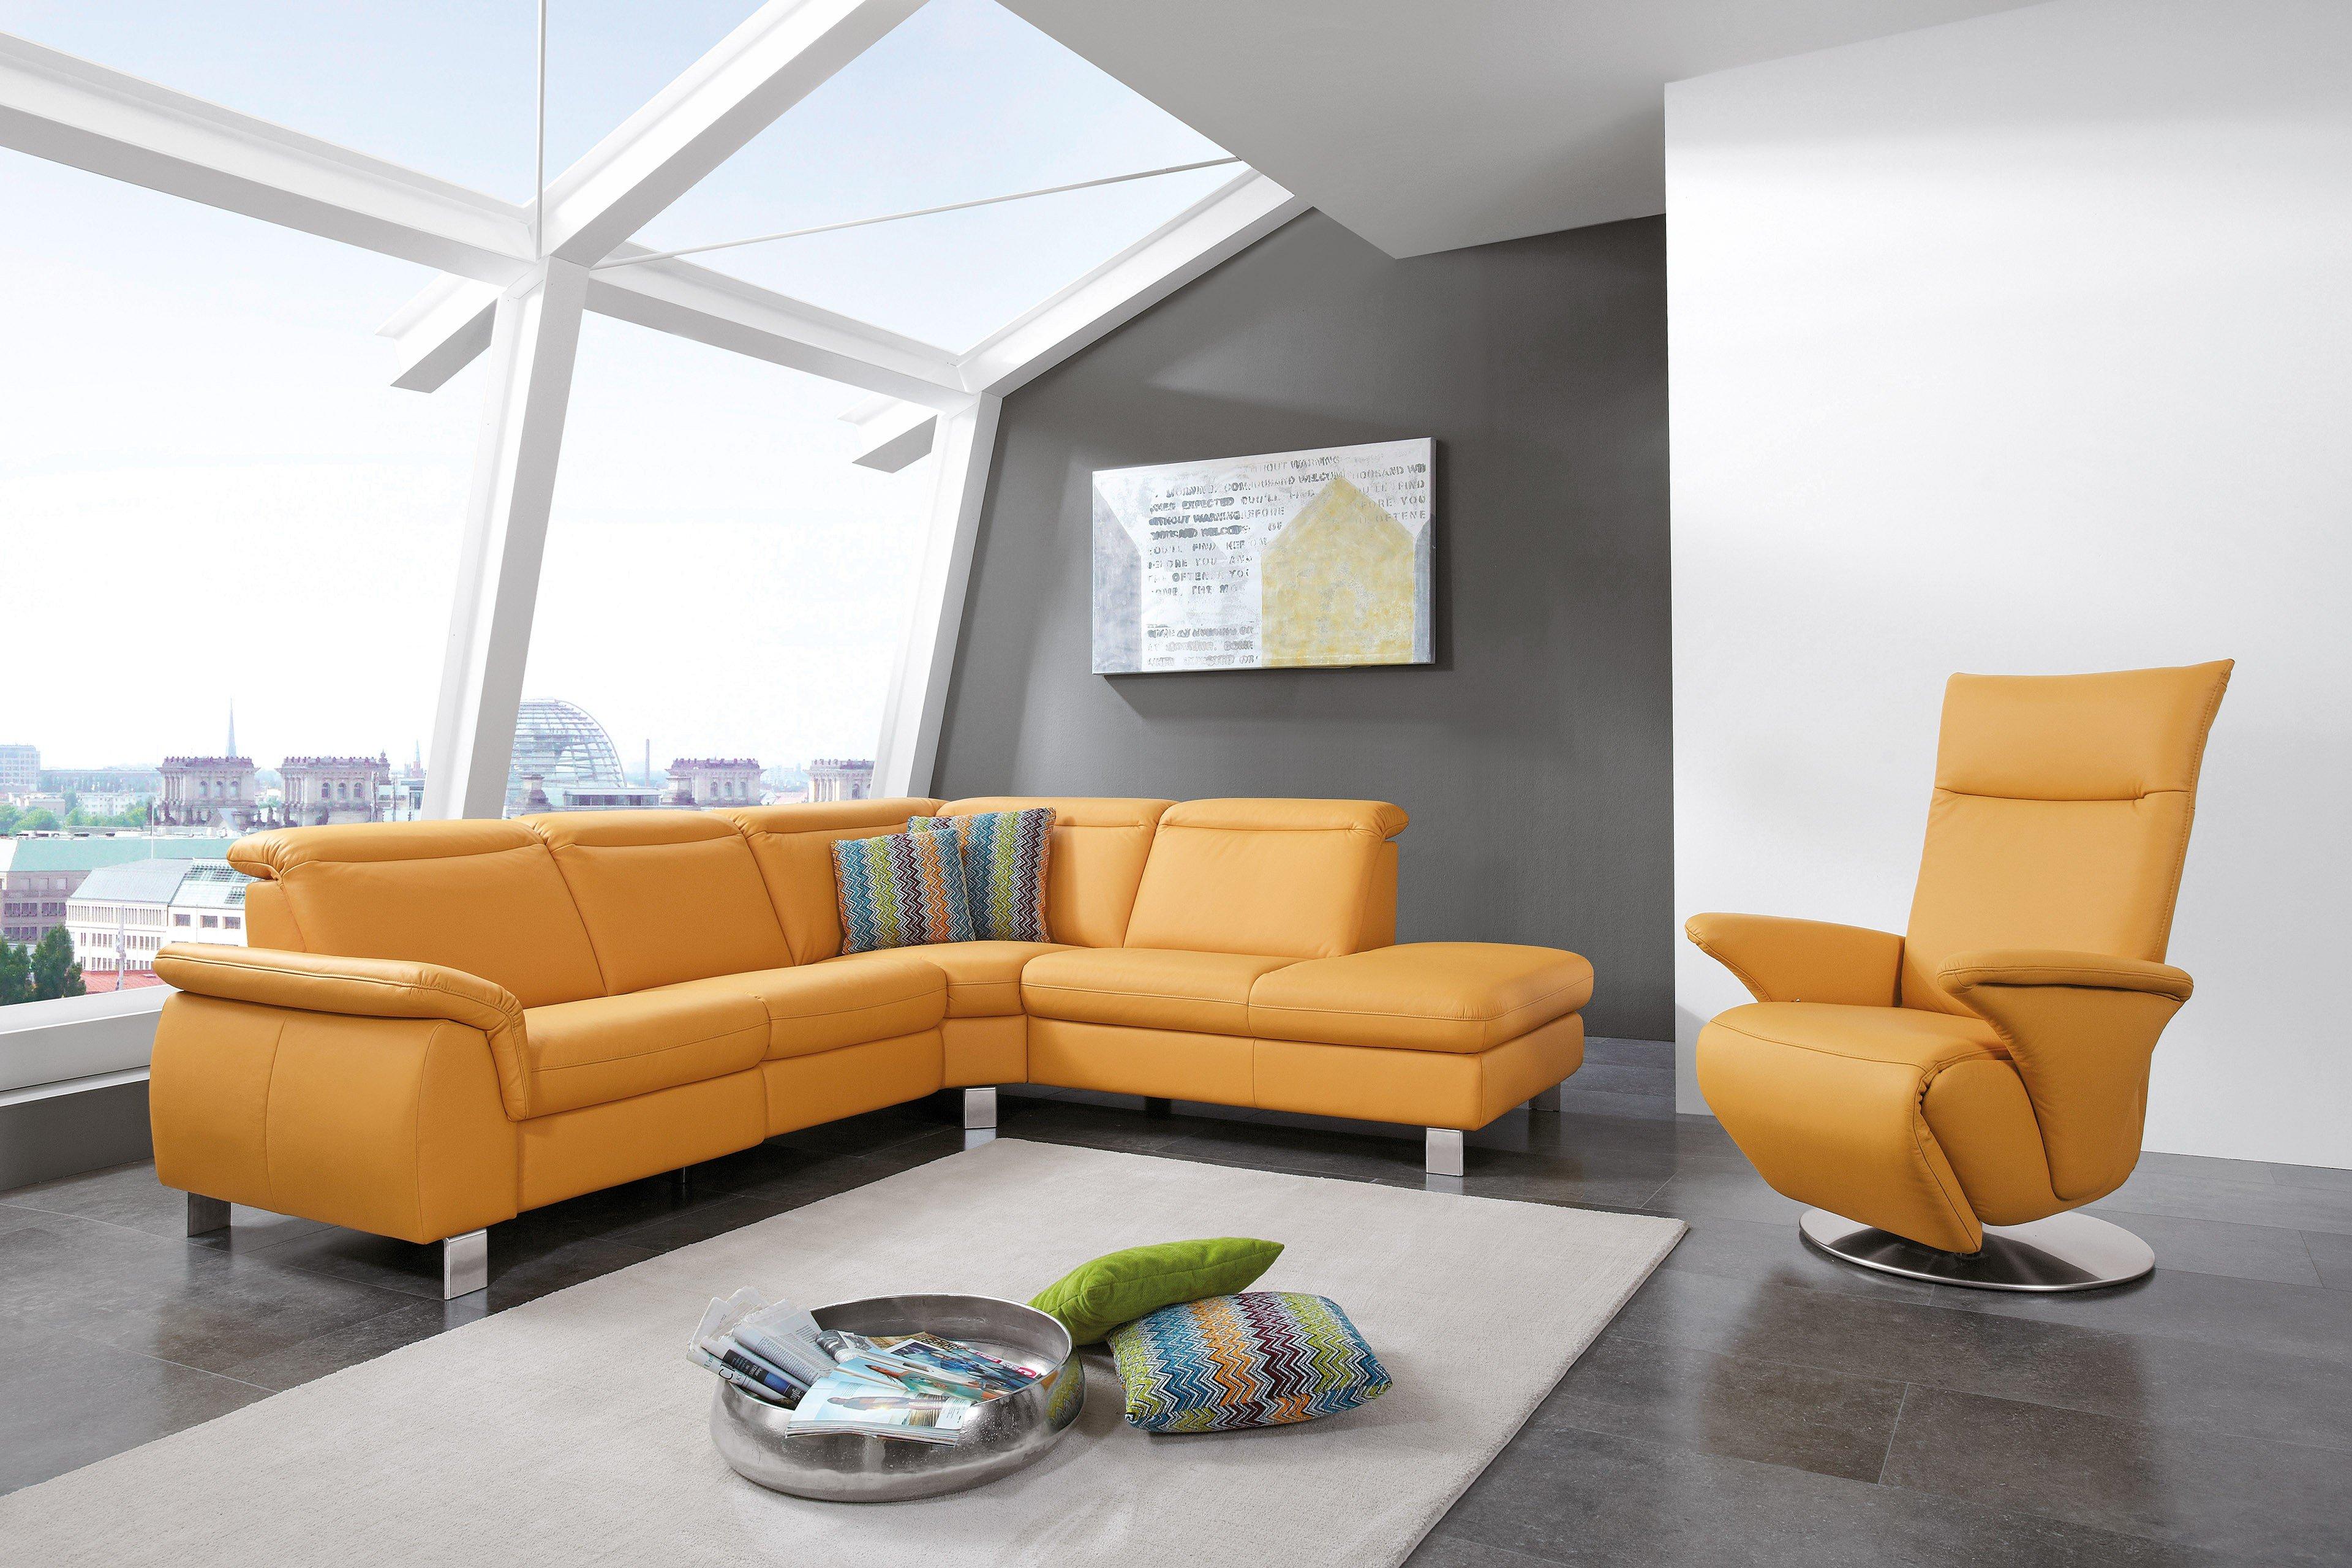 ledergarnitur motion von polsteria polsterm bel m bel letz ihr online shop. Black Bedroom Furniture Sets. Home Design Ideas